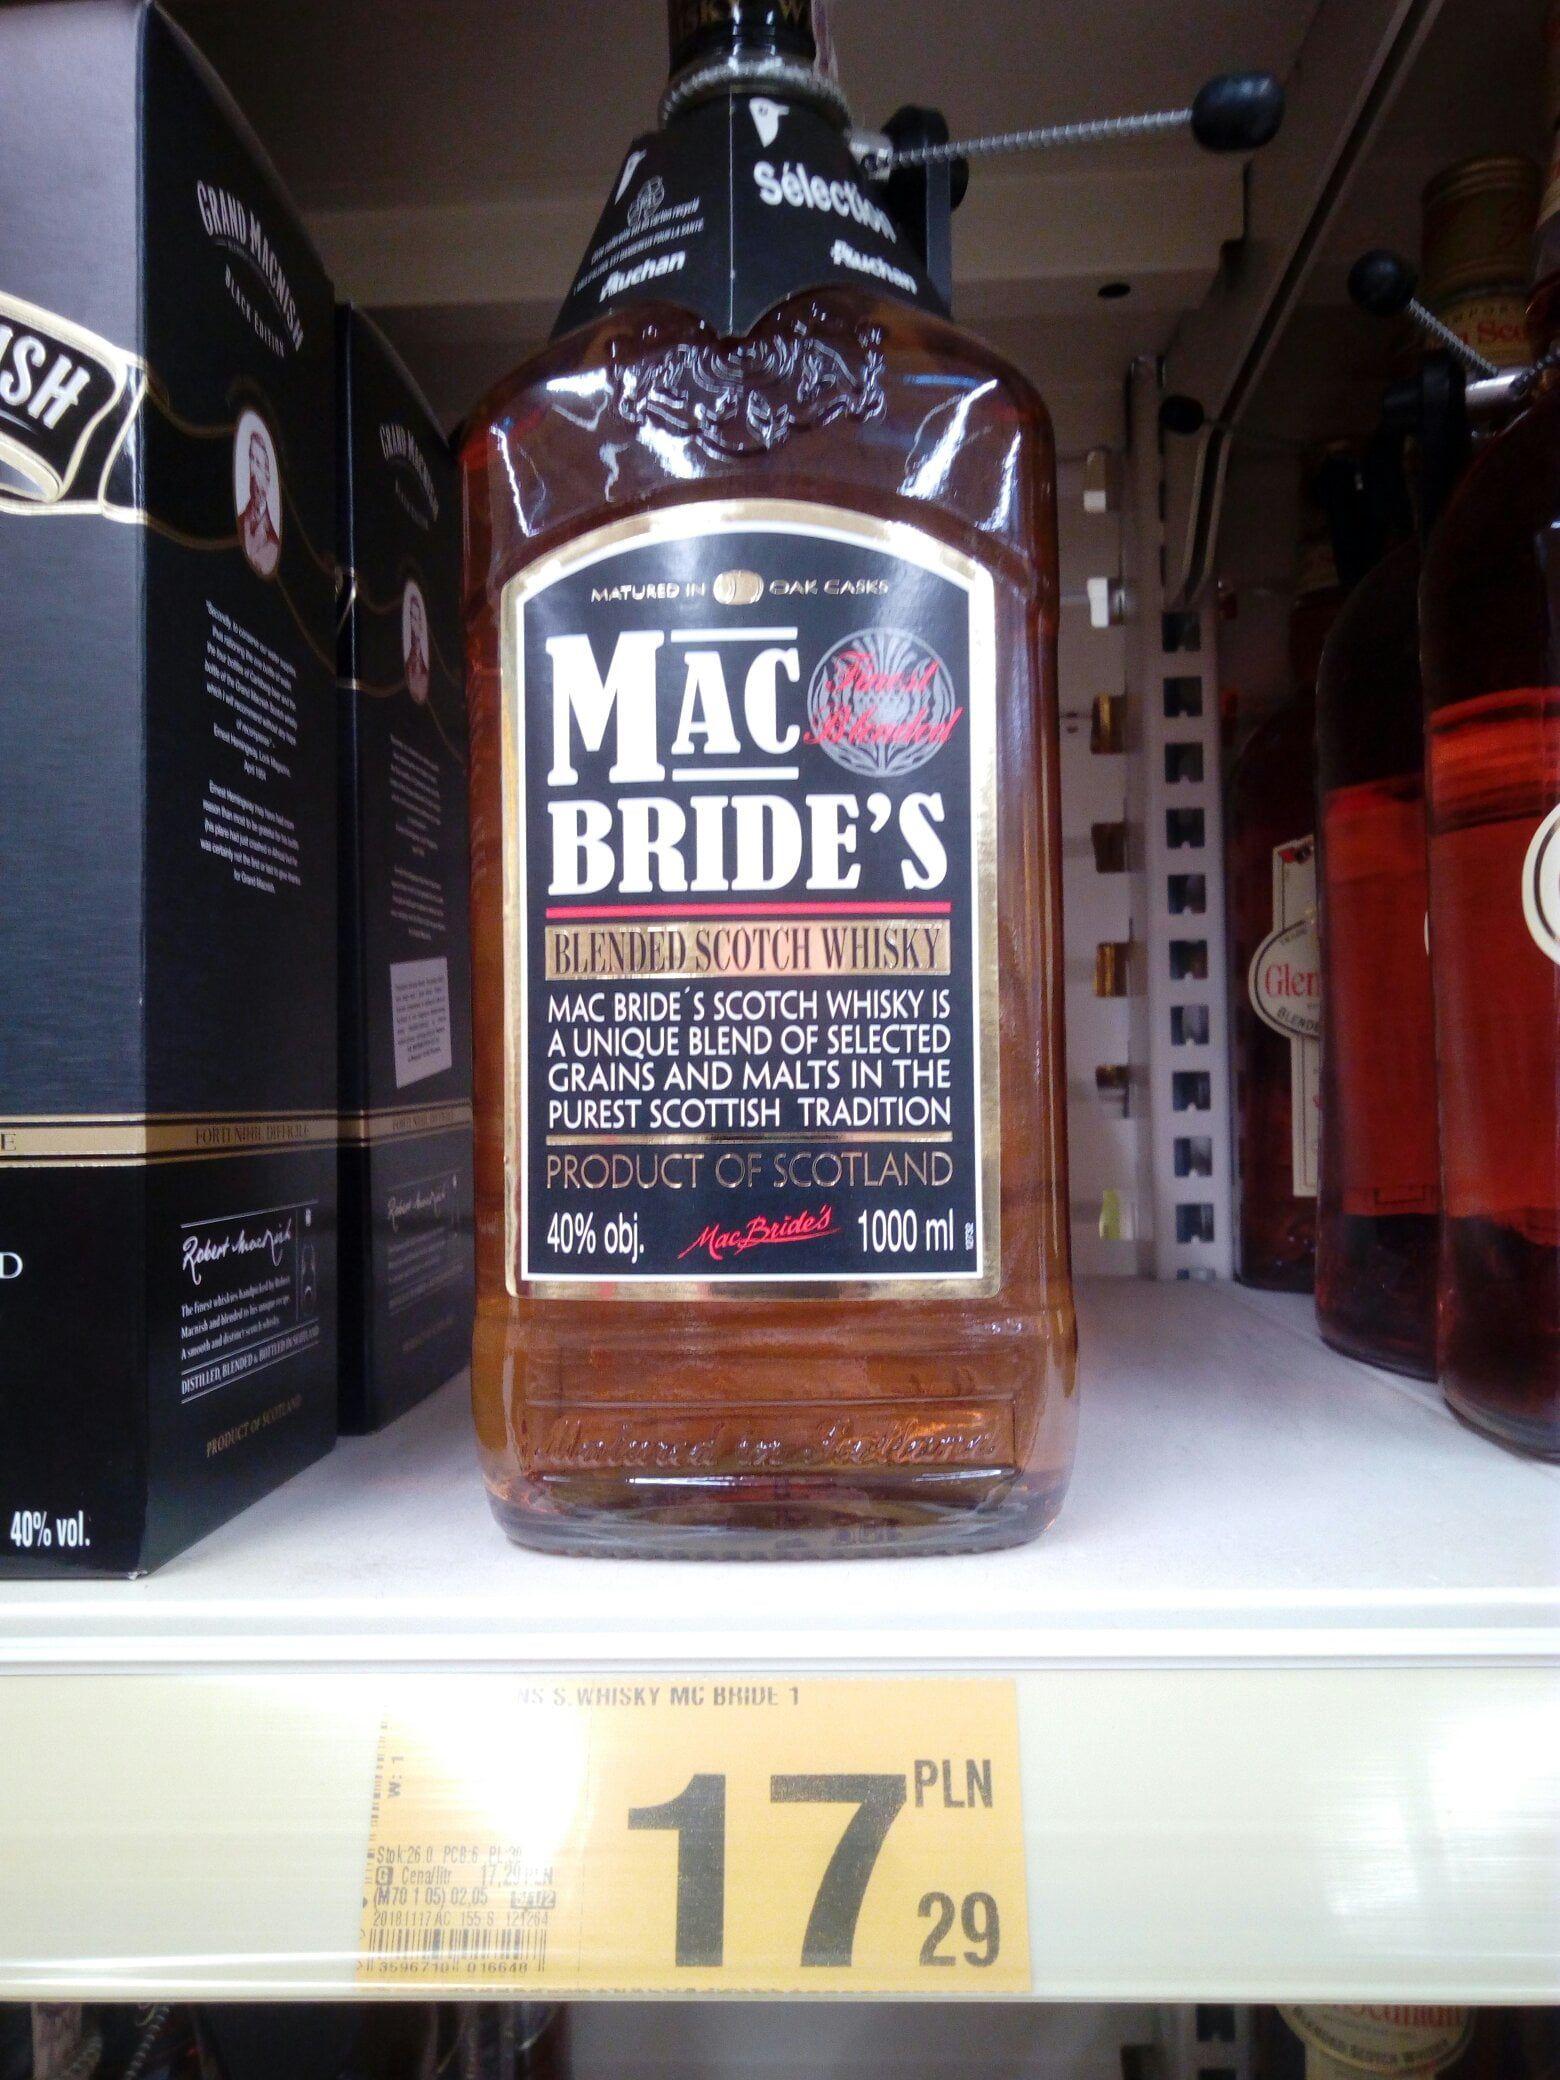 Whisky Mac Bride's za 17 zł (1 litr) - Lublin, Auchan